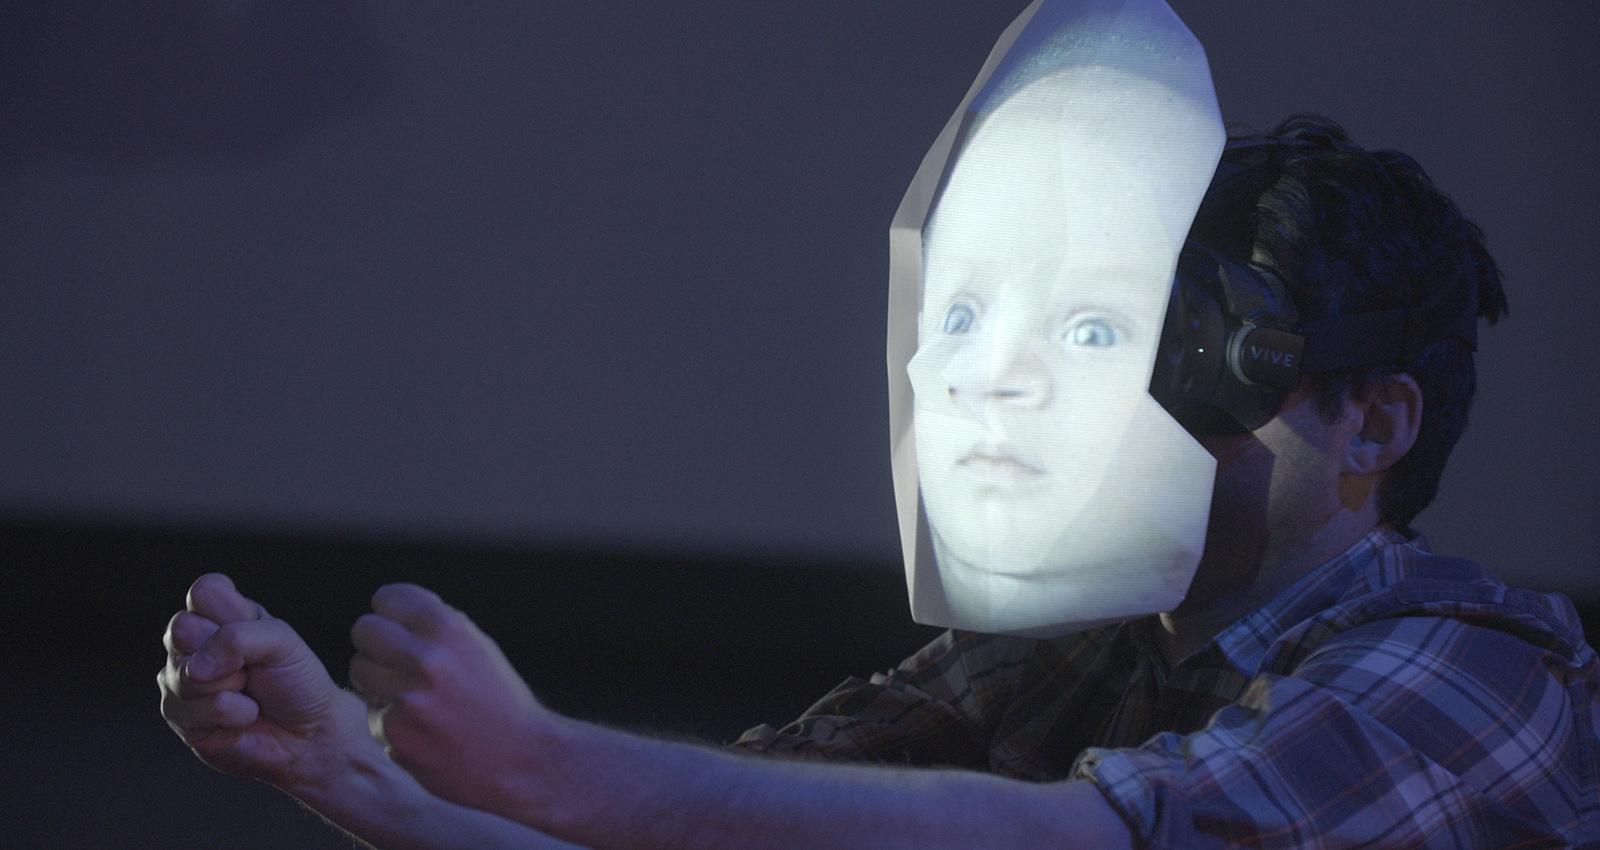 Digital Puppetry